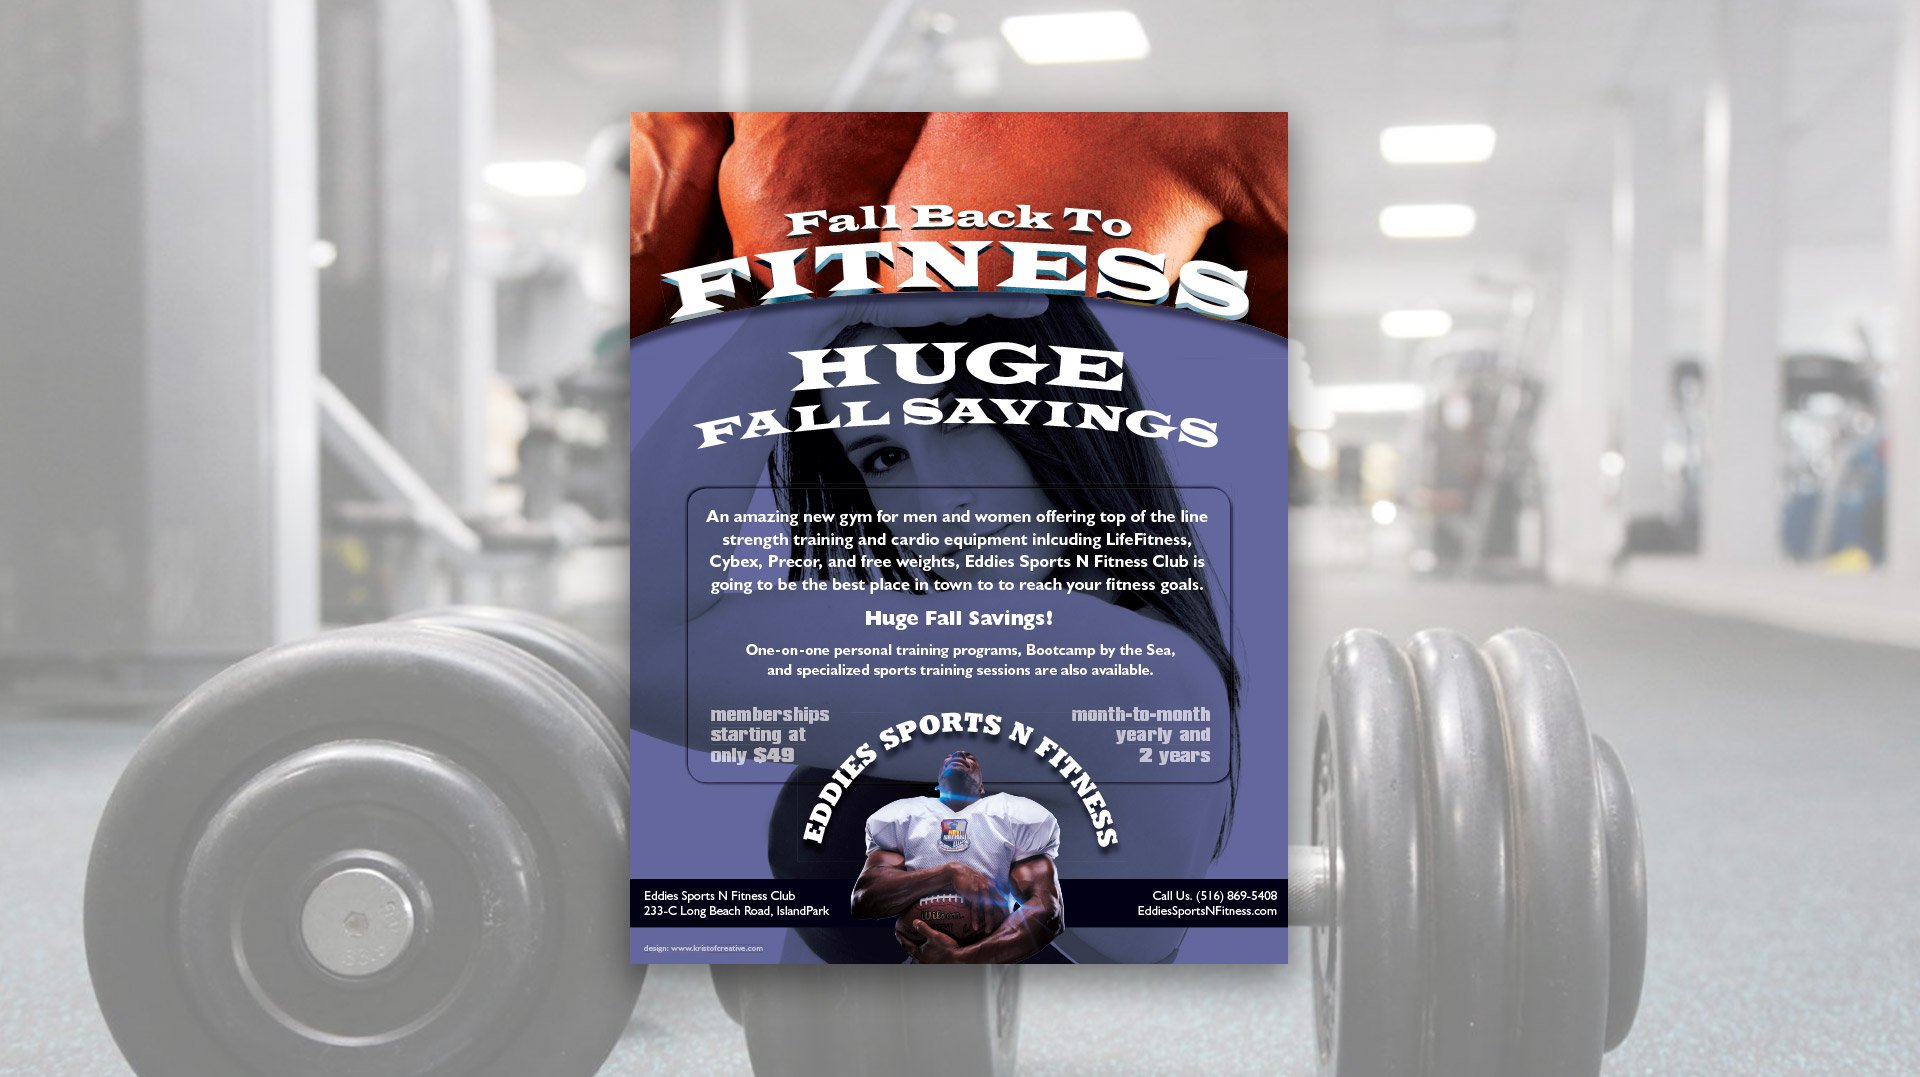 Gym Flyer Design for Eddies Sports N Fitness